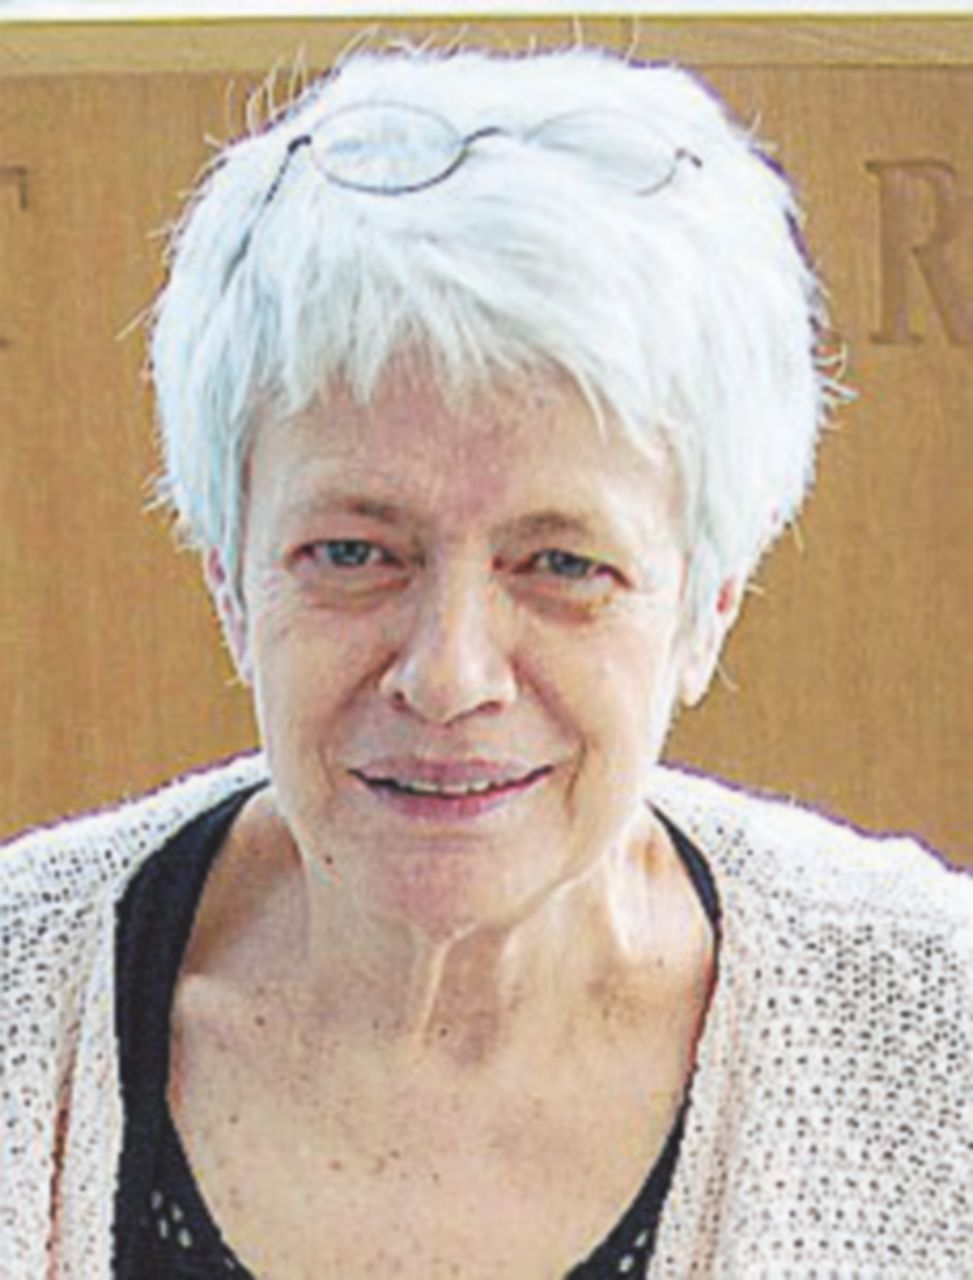 Premio Calamandrei 2017, premiata Barbara Spinelli